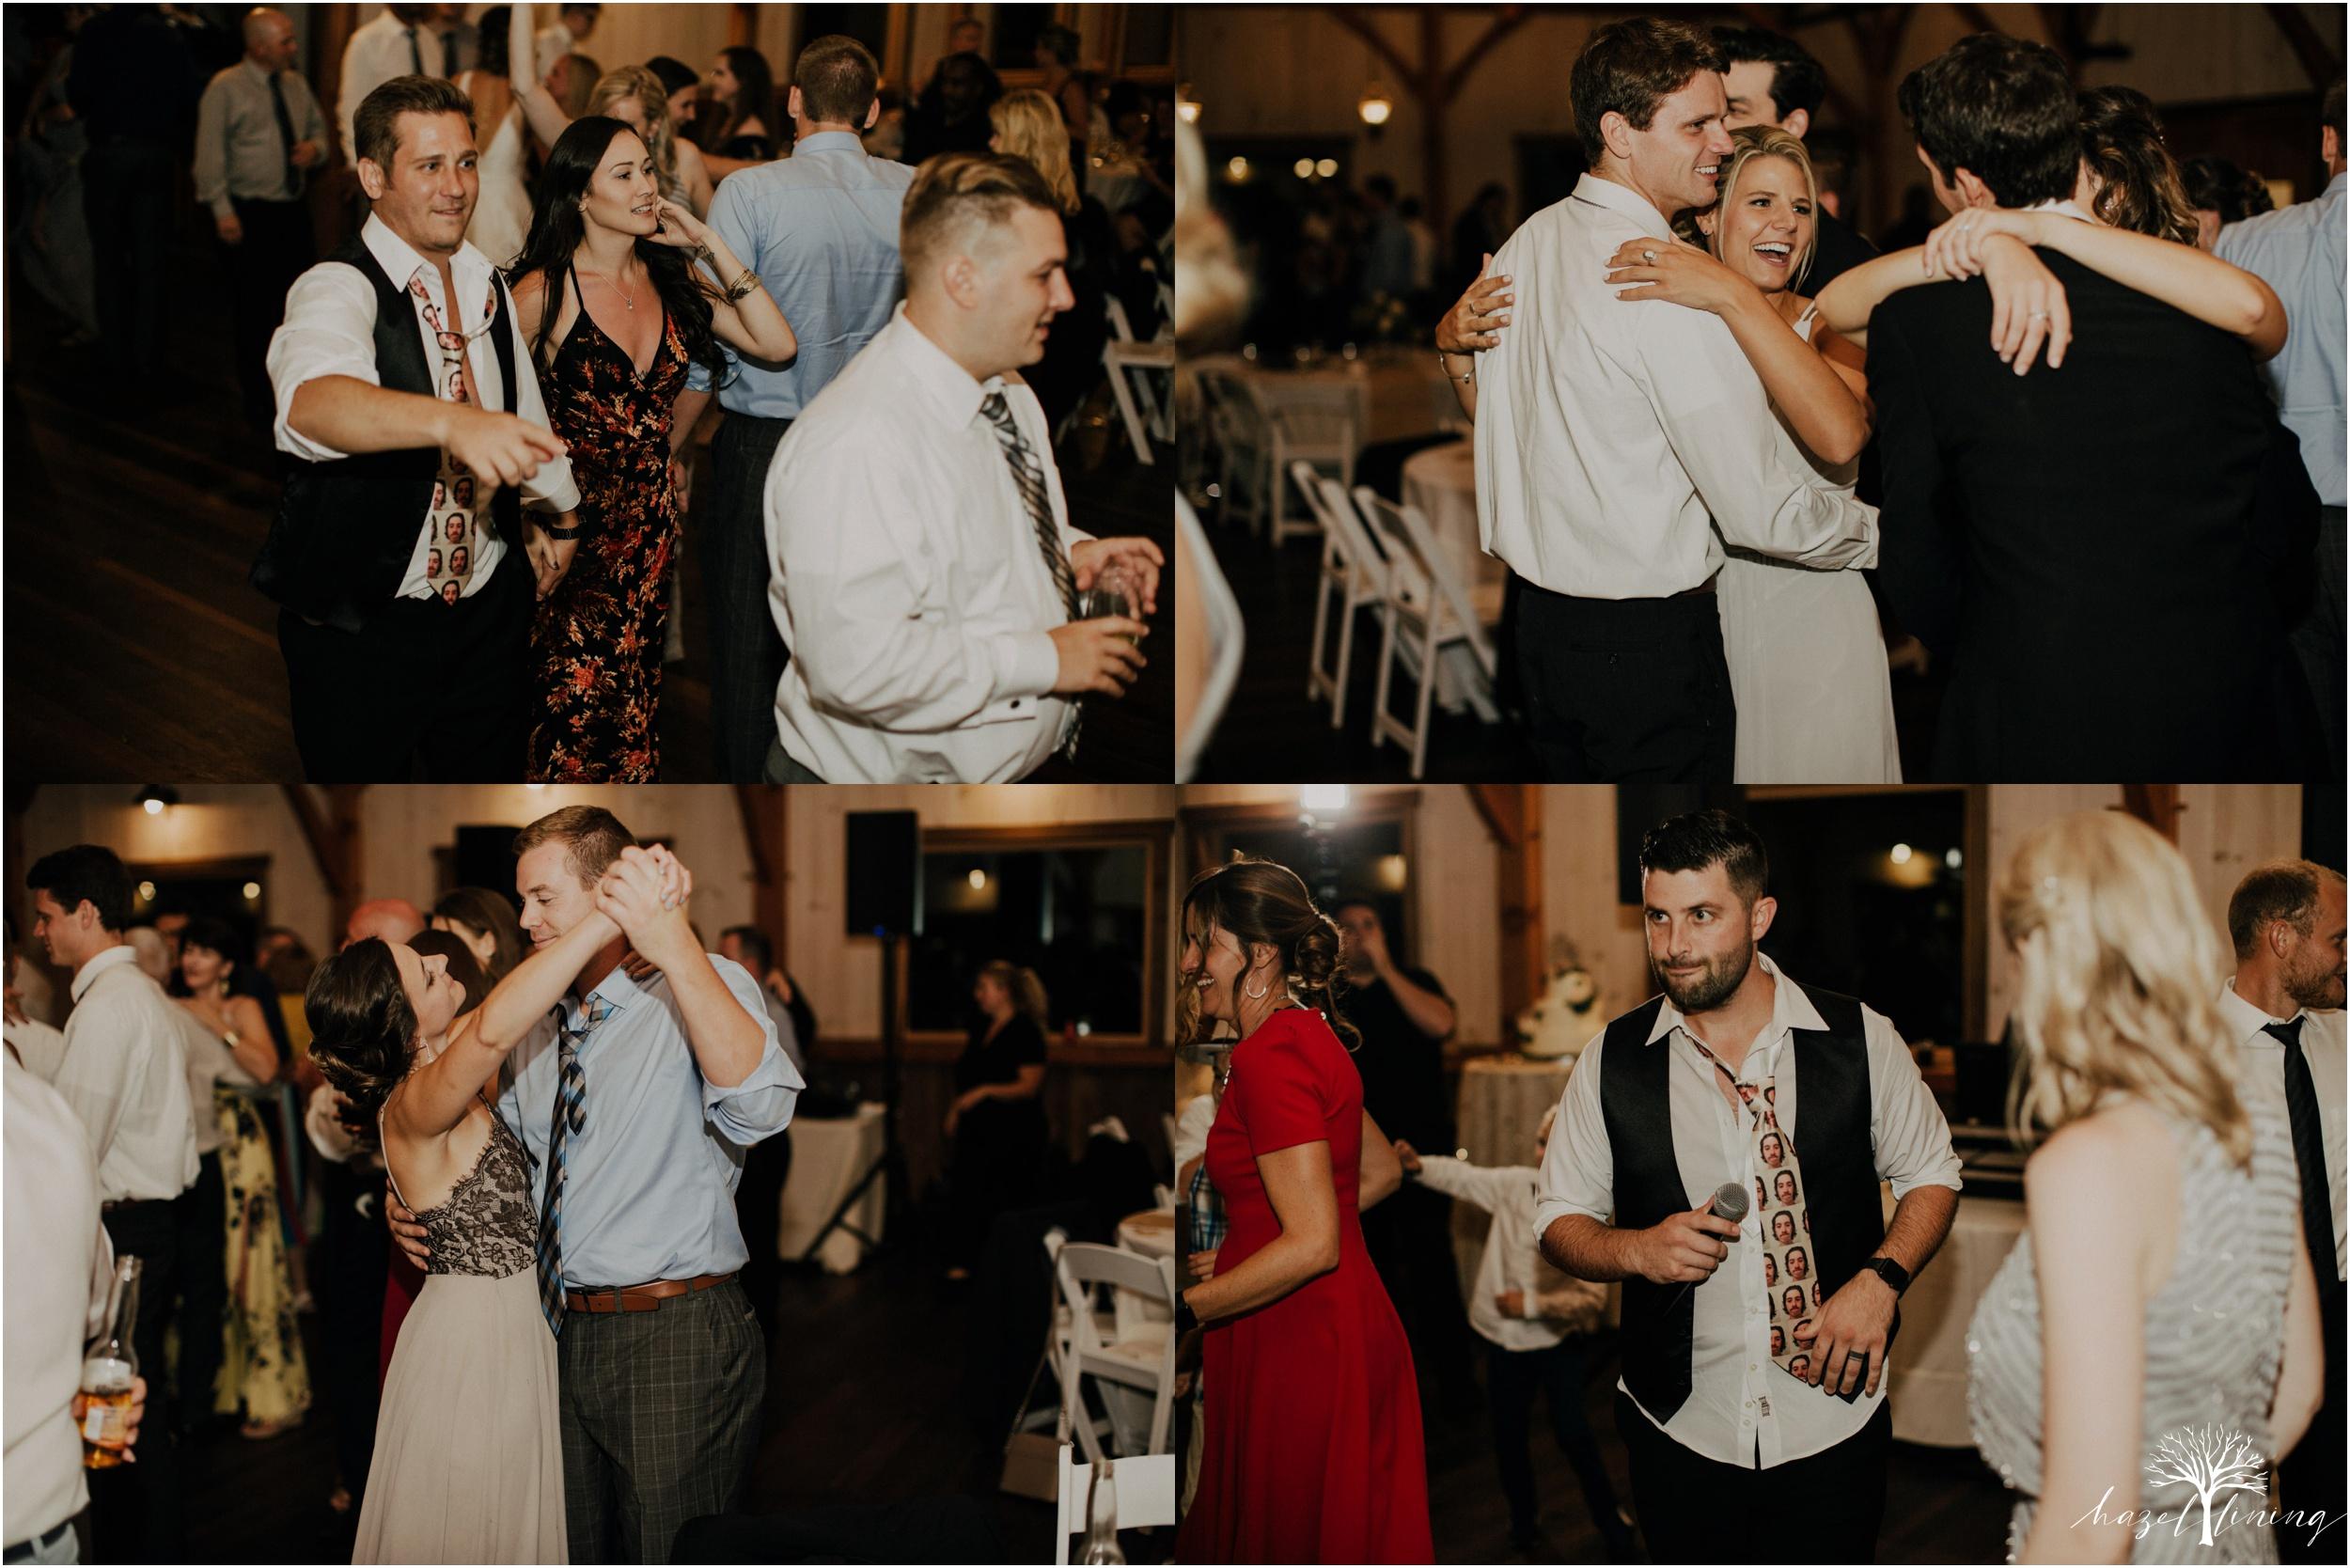 maureen-hepner-anthony-giordano-rose-bank-winery-newtow-pennsylvania-luxury-summer-wedding-hazel-lining-photography-destination-elopement-wedding-engagement-photography_0152.jpg